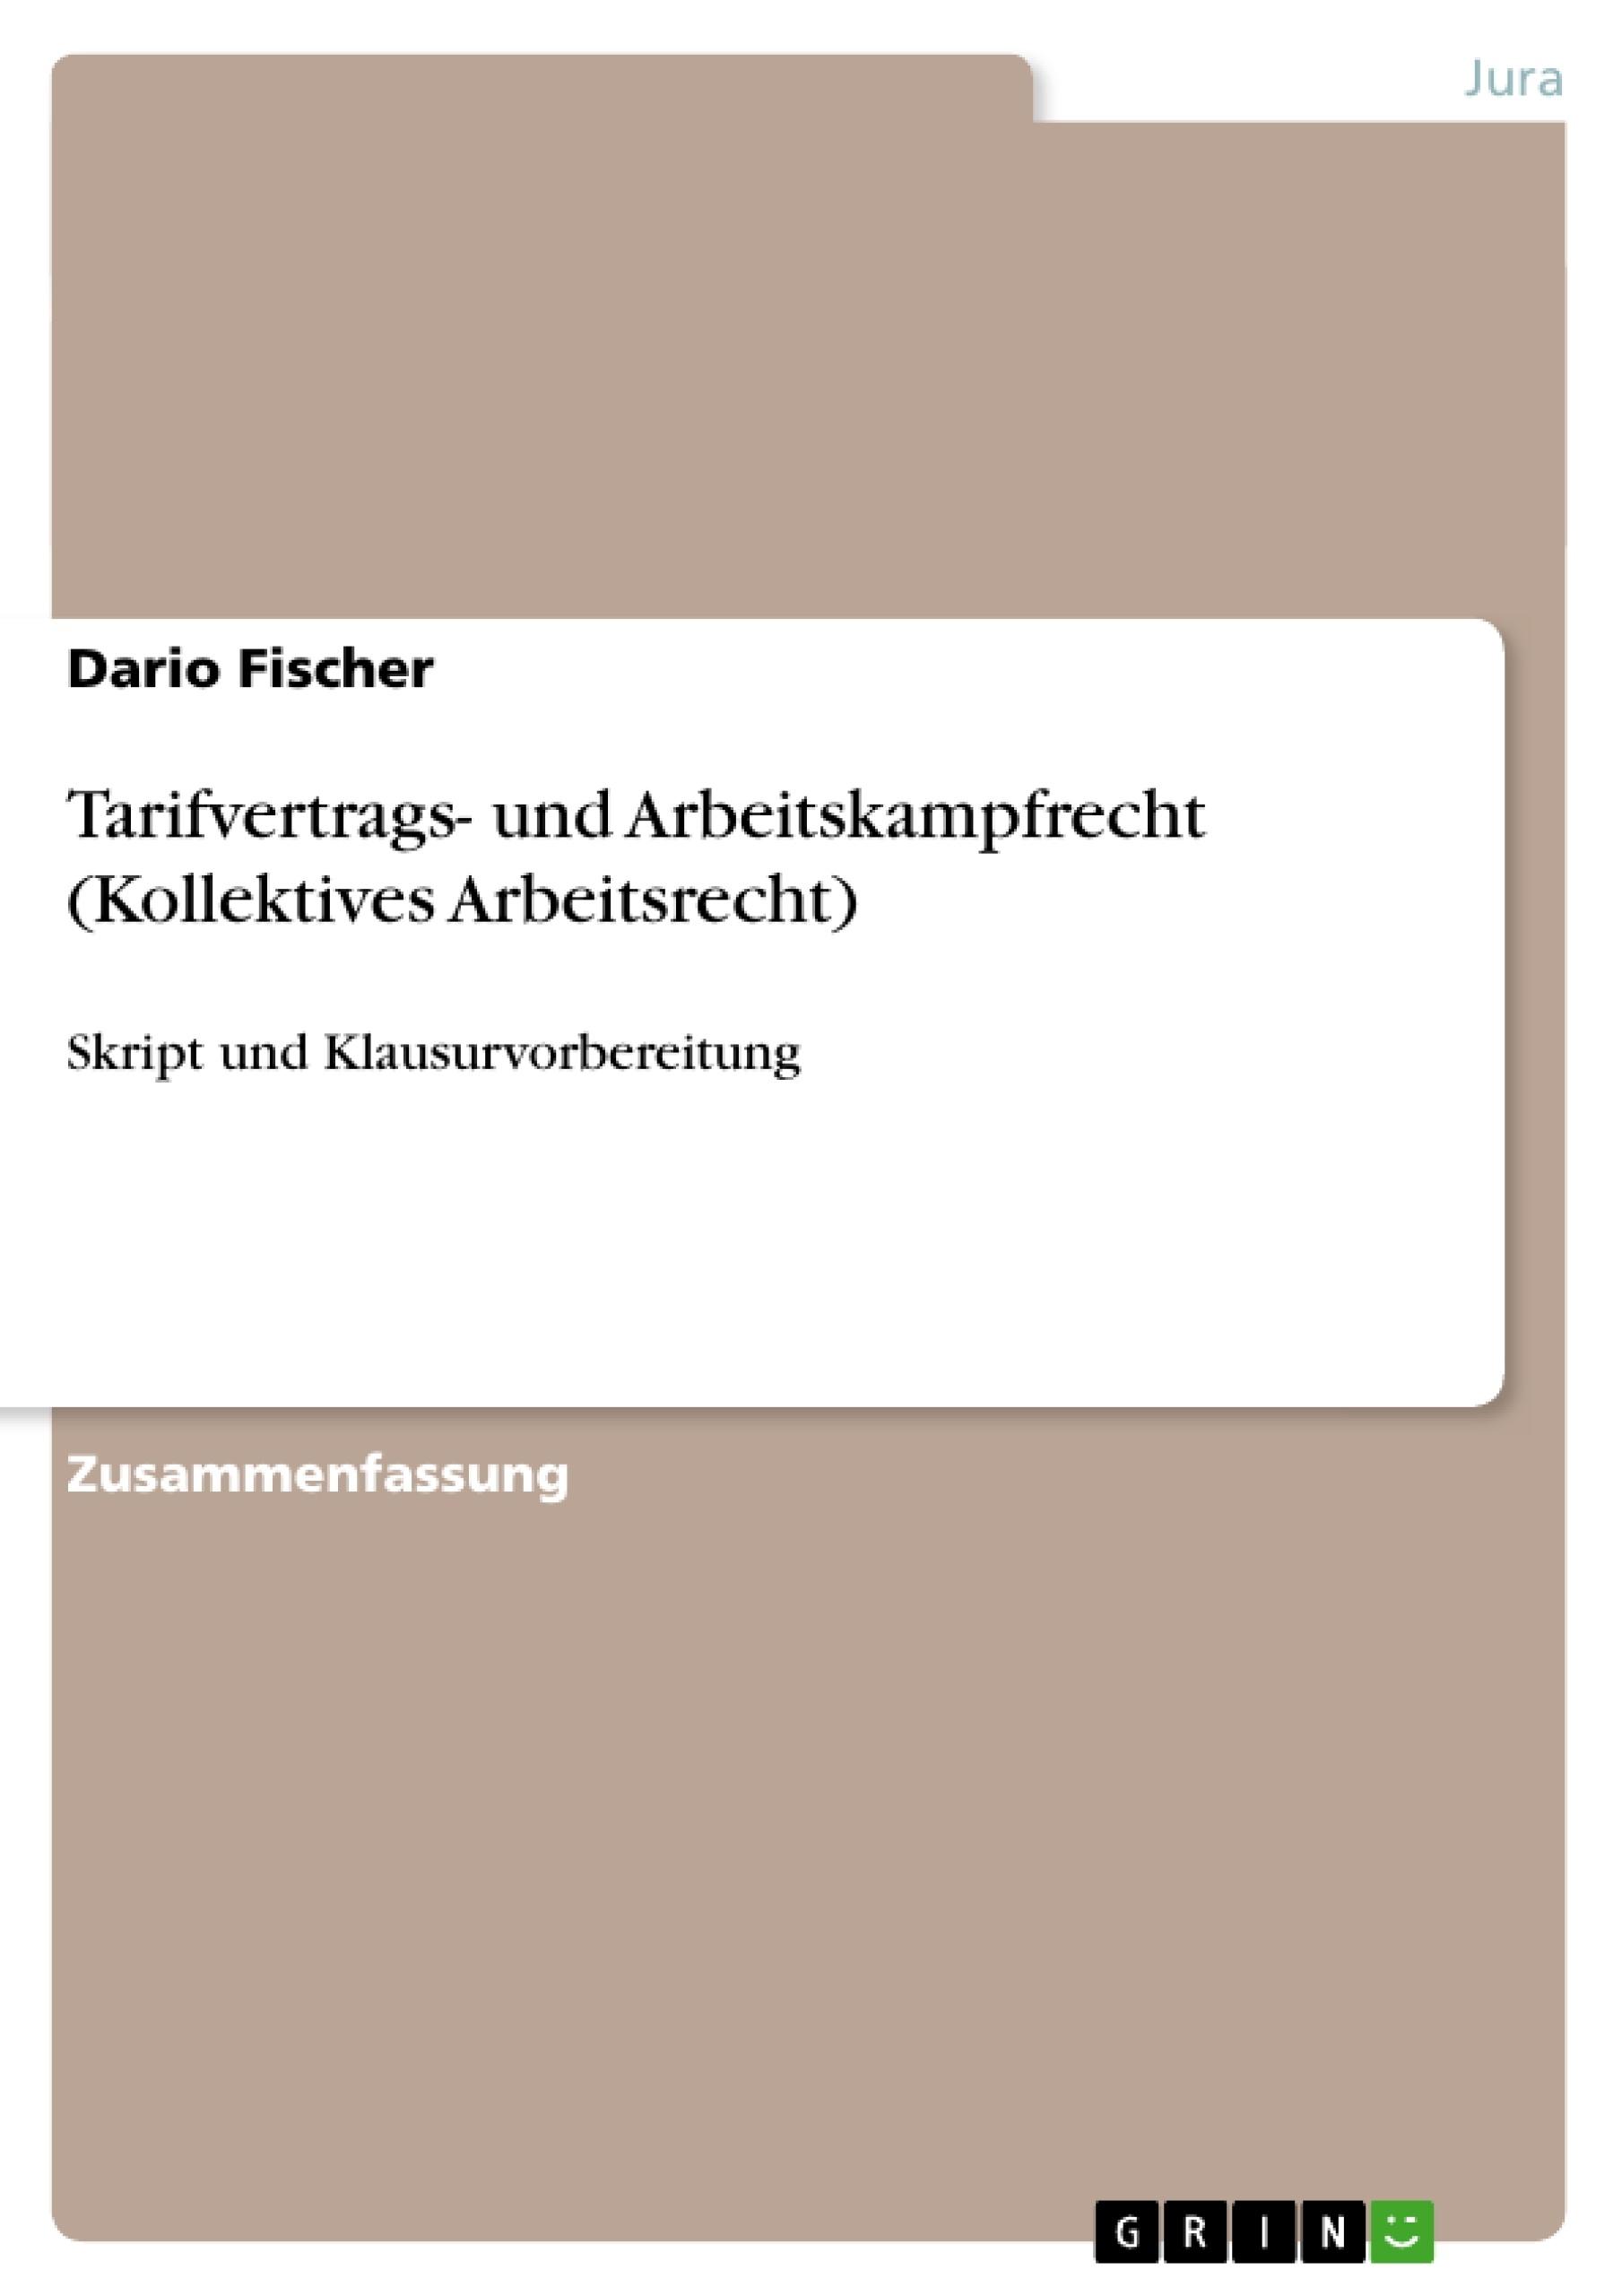 Titel: Tarifvertrags- und Arbeitskampfrecht (Kollektives Arbeitsrecht)